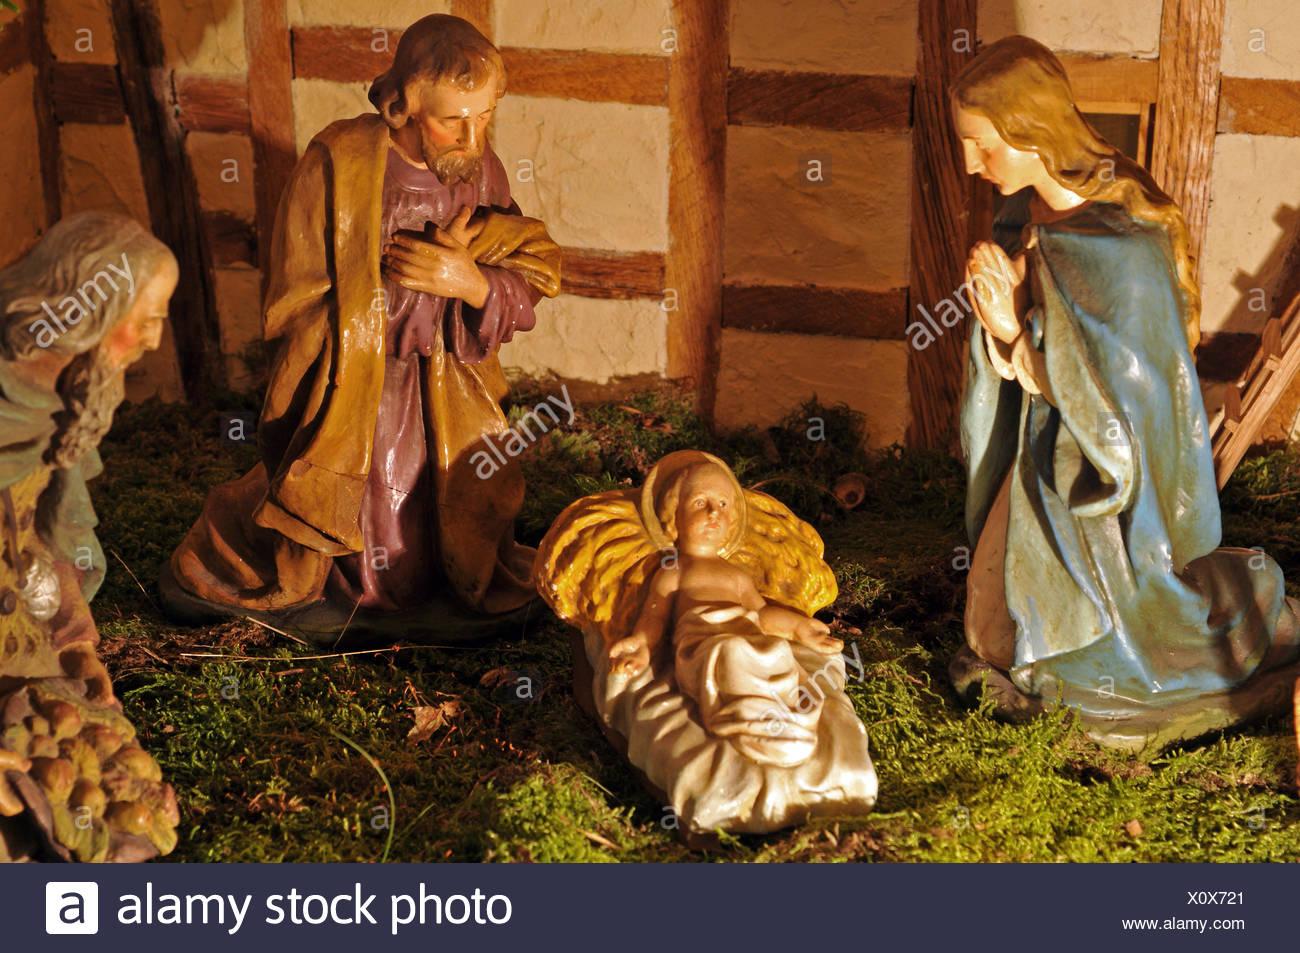 Bilder Krippe Weihnachten.Krippe Weihnachten Krippe Weihnachten Stockfoto Bild 275942185 Alamy